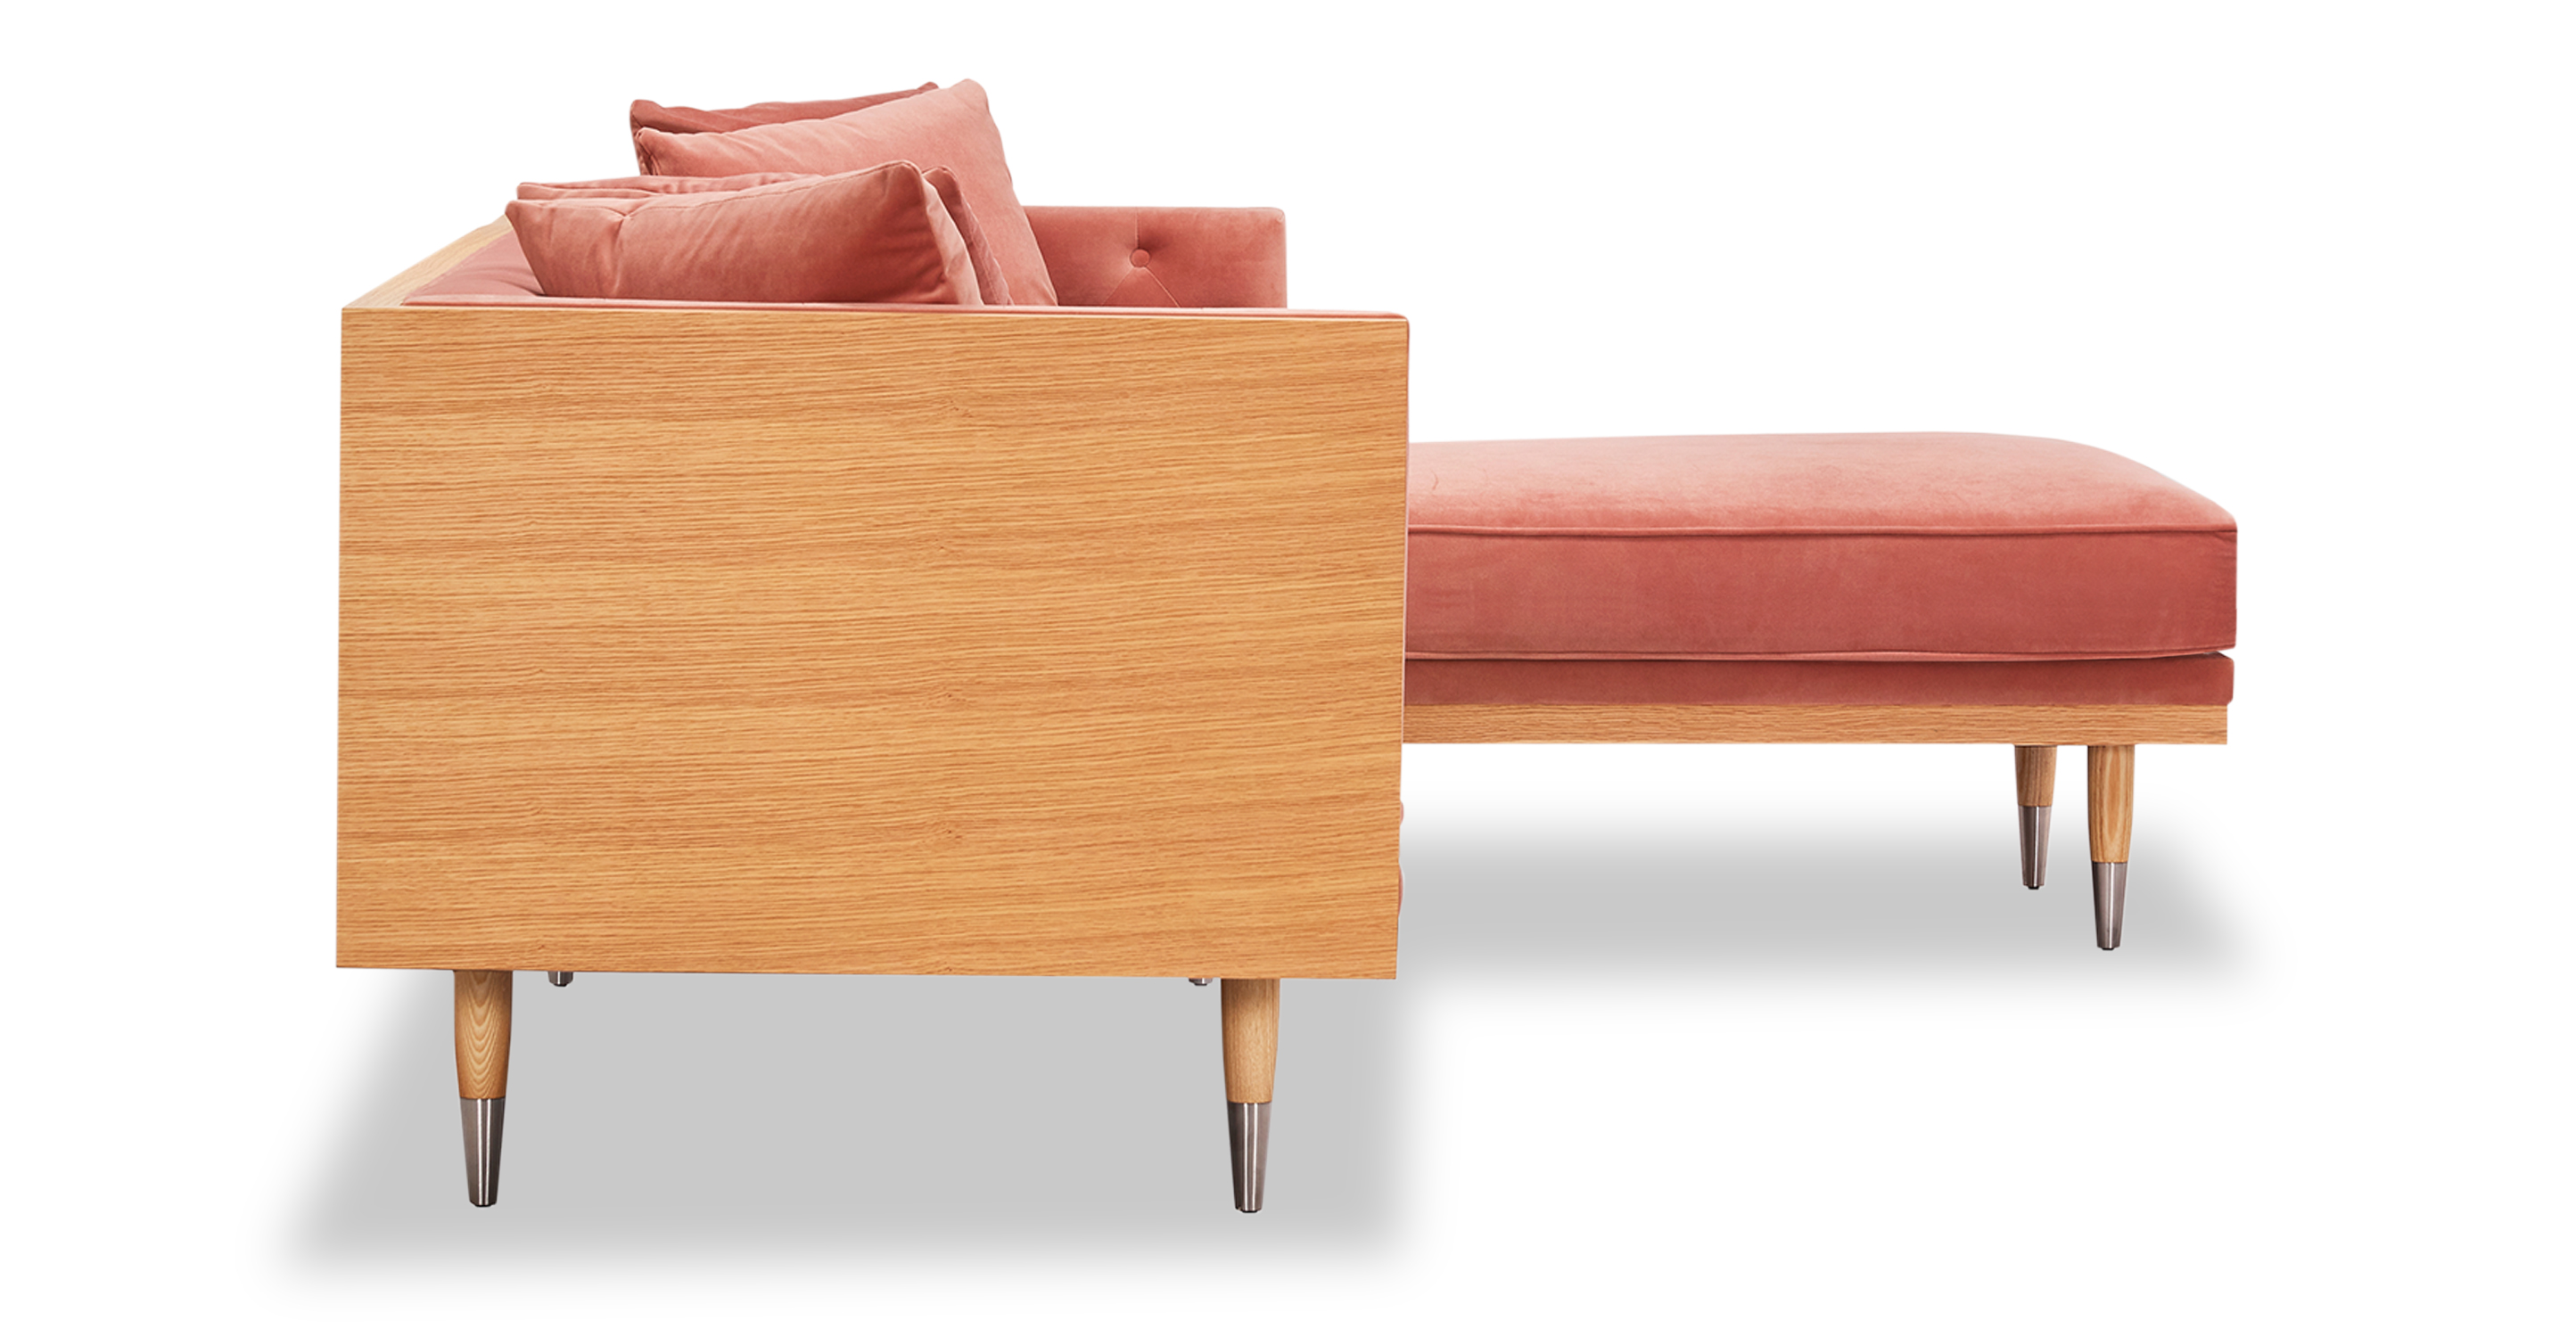 "Woodrow Neo 99"" Sofa Sectional Right, Ash/Blush"